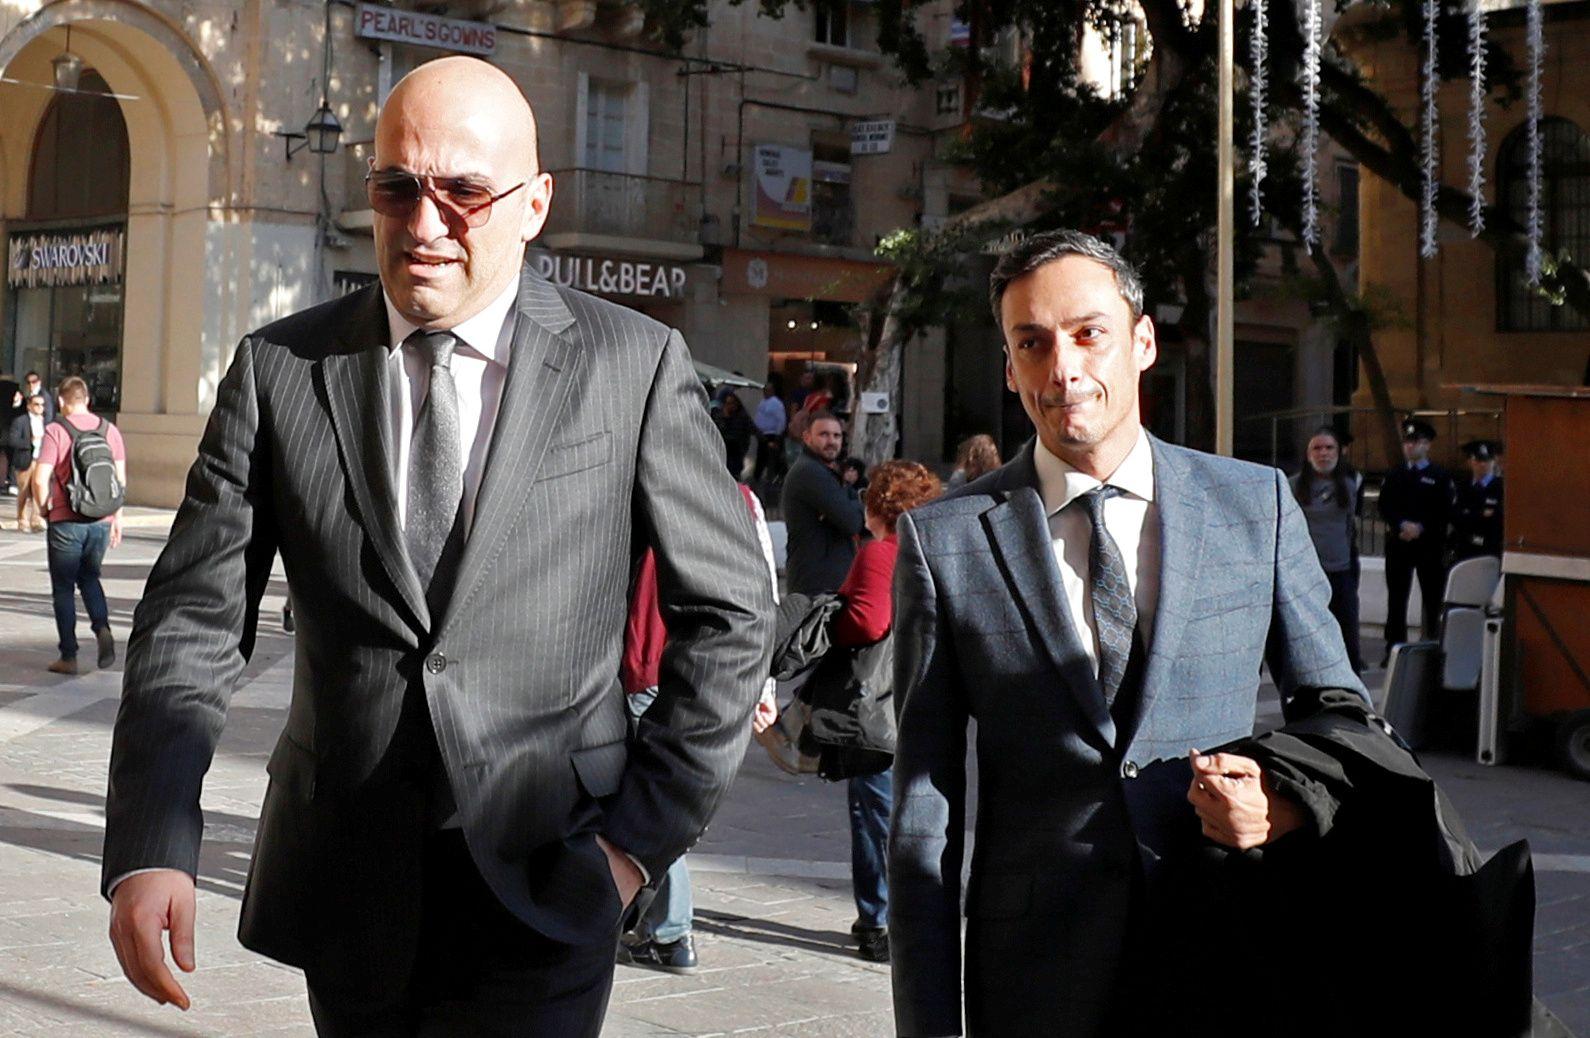 Malta Yorgen Fenech am Gericht